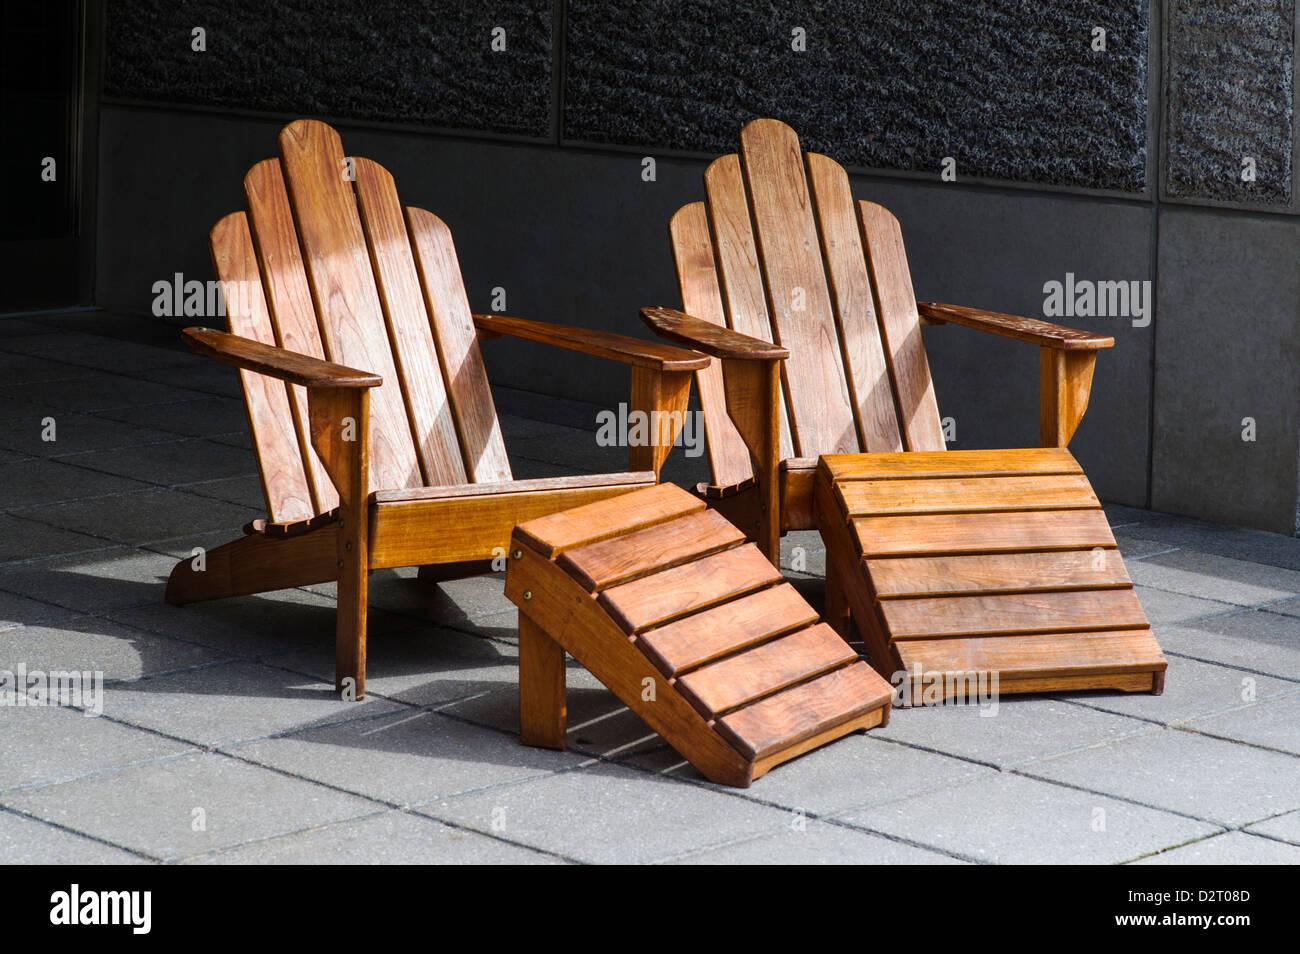 Adirondack Chairs Stock Photos Adirondack Chairs Stock Images Alamy